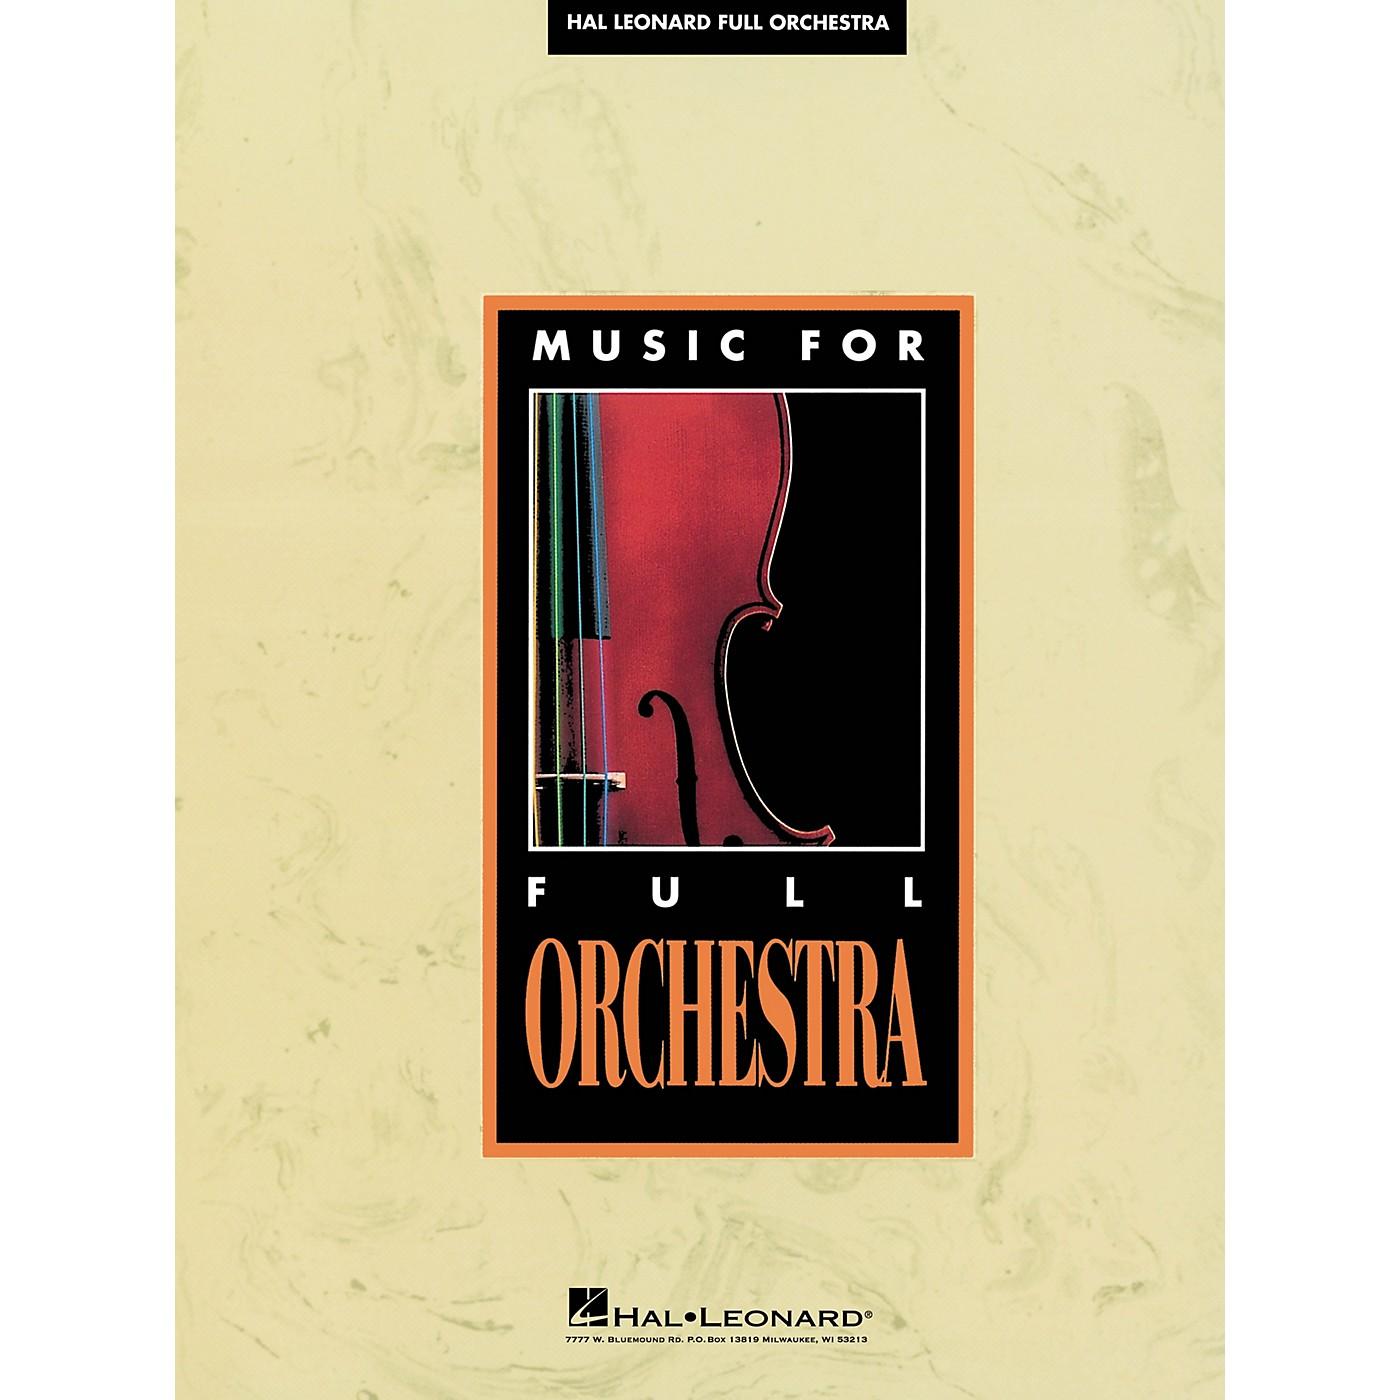 Ricordi Conc in D Minor for Violin Strings and Basso Continuo RV243 Orchestra by Vivaldi Edited by Malipiero thumbnail